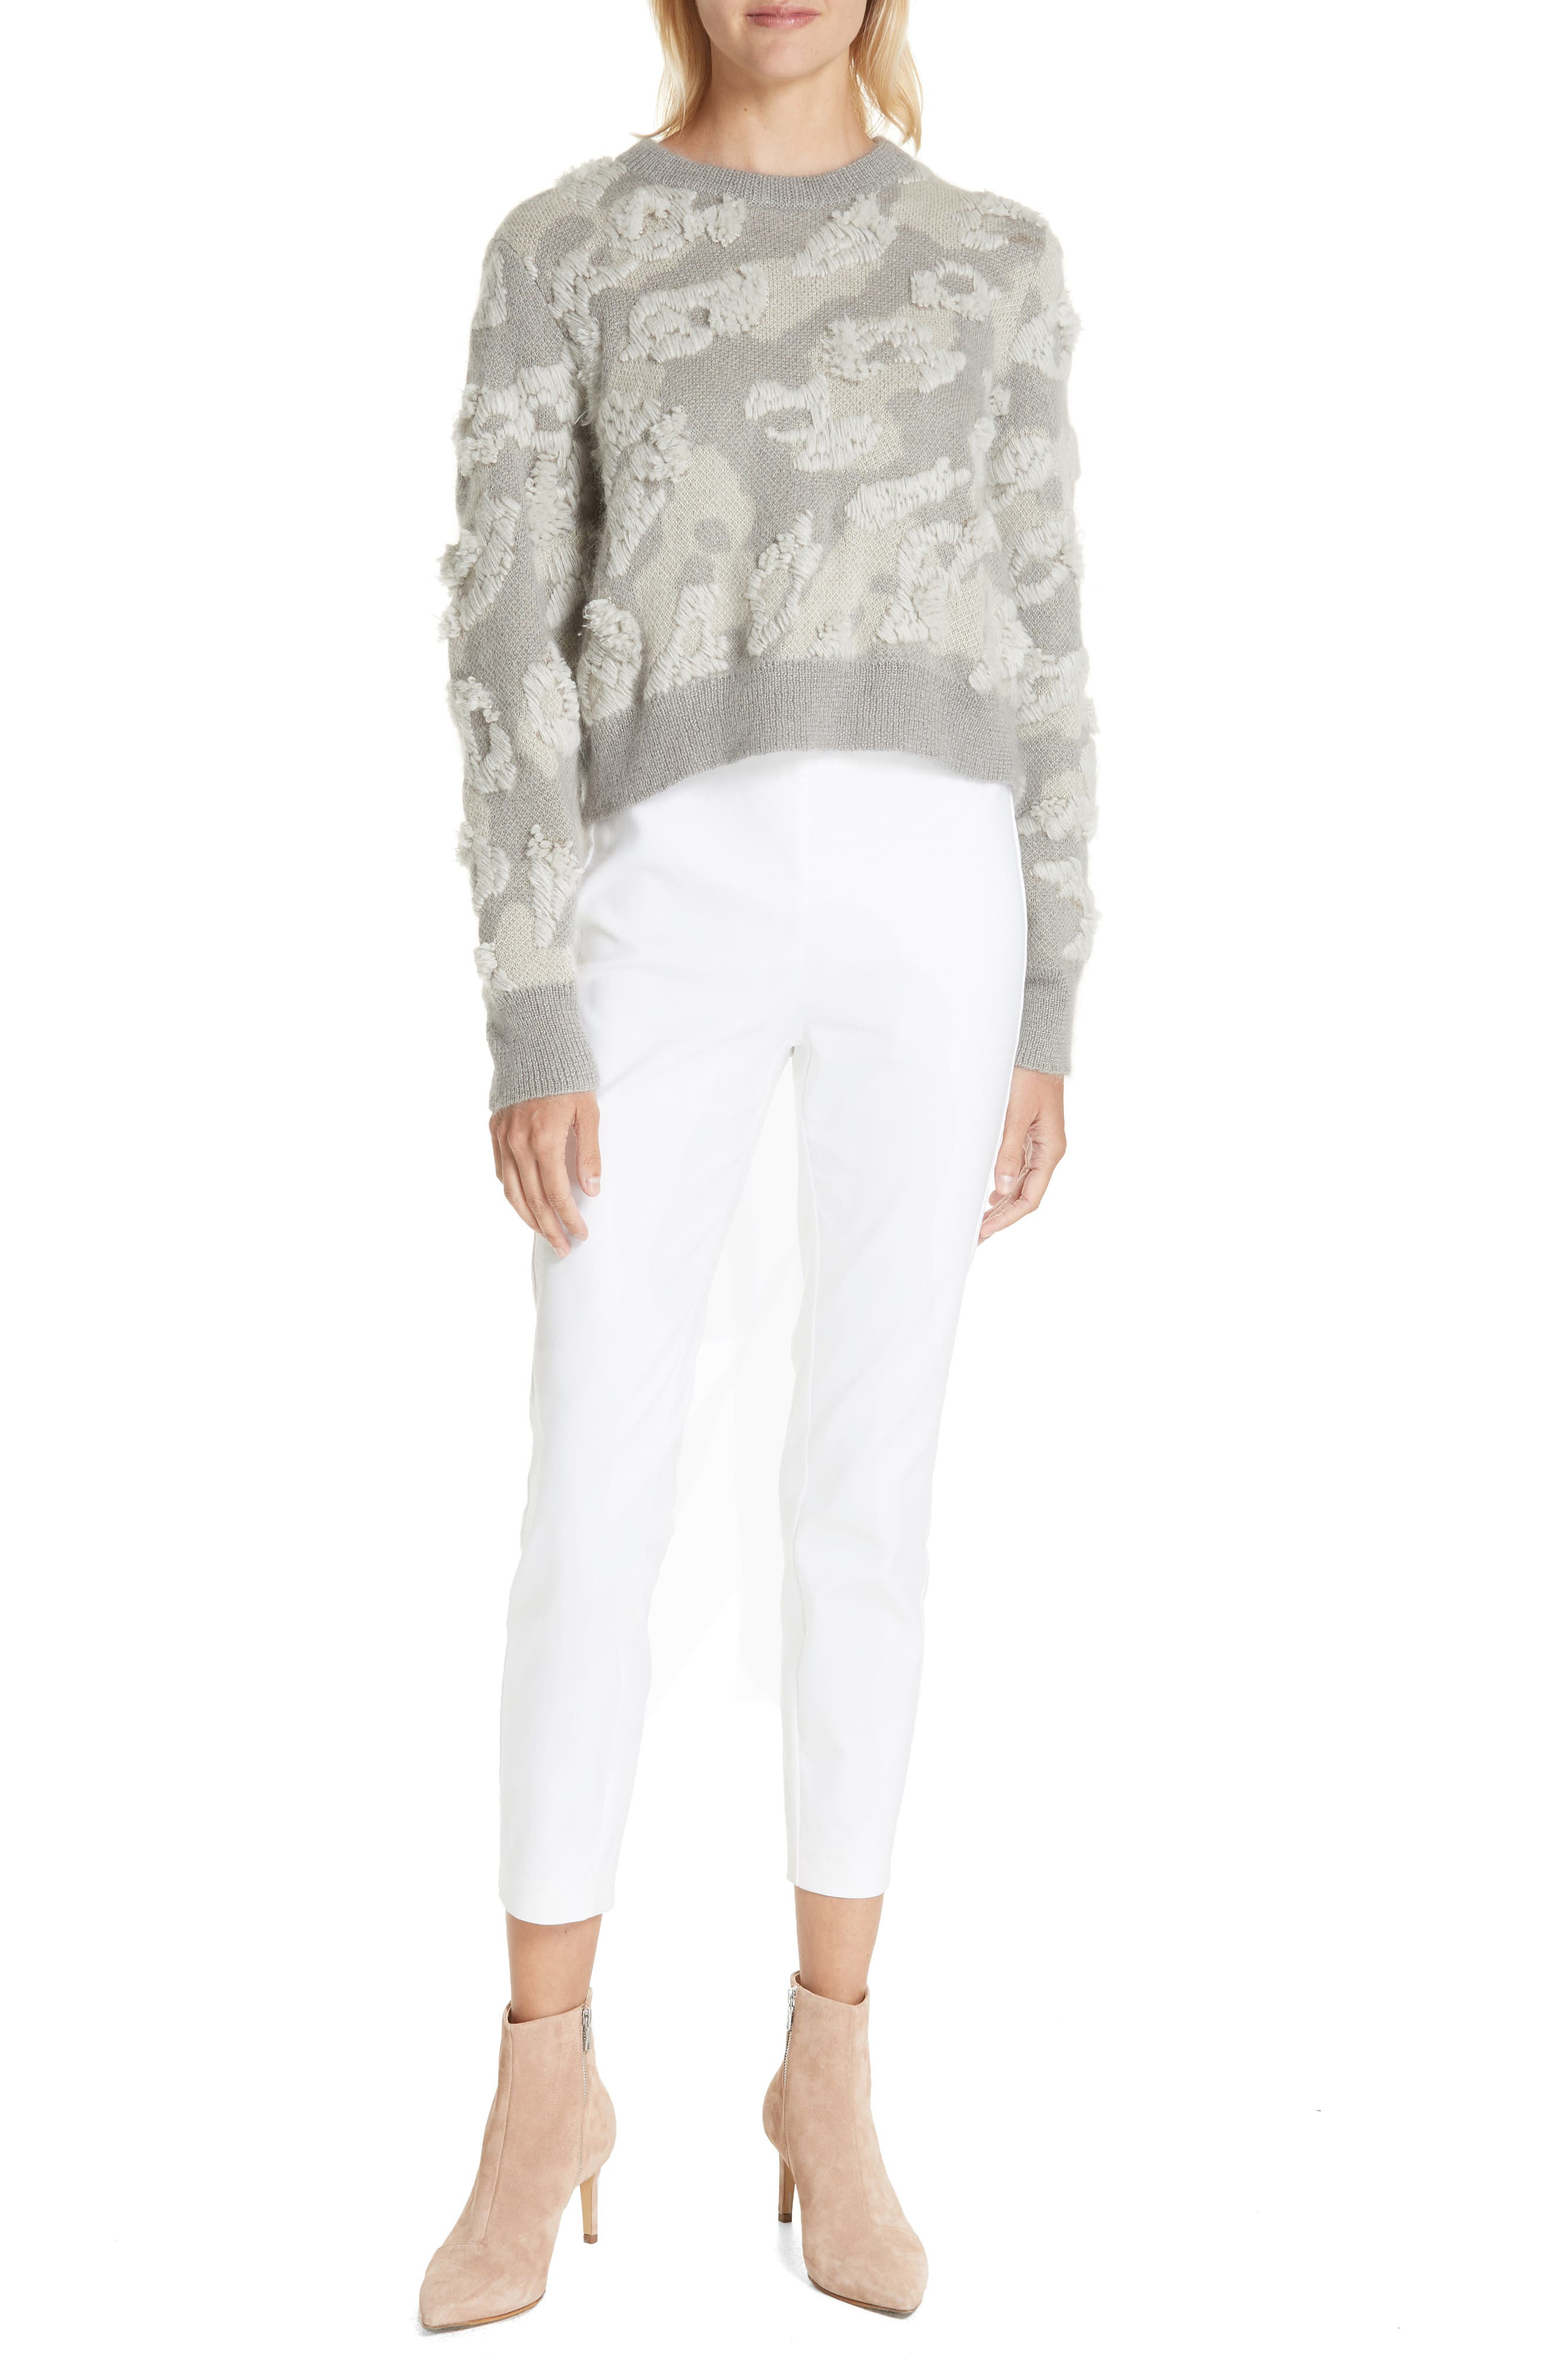 RAG & BONE,                             Embroidered Leopard Spot Sweater,                             Alternate thumbnail 7, color,                             900